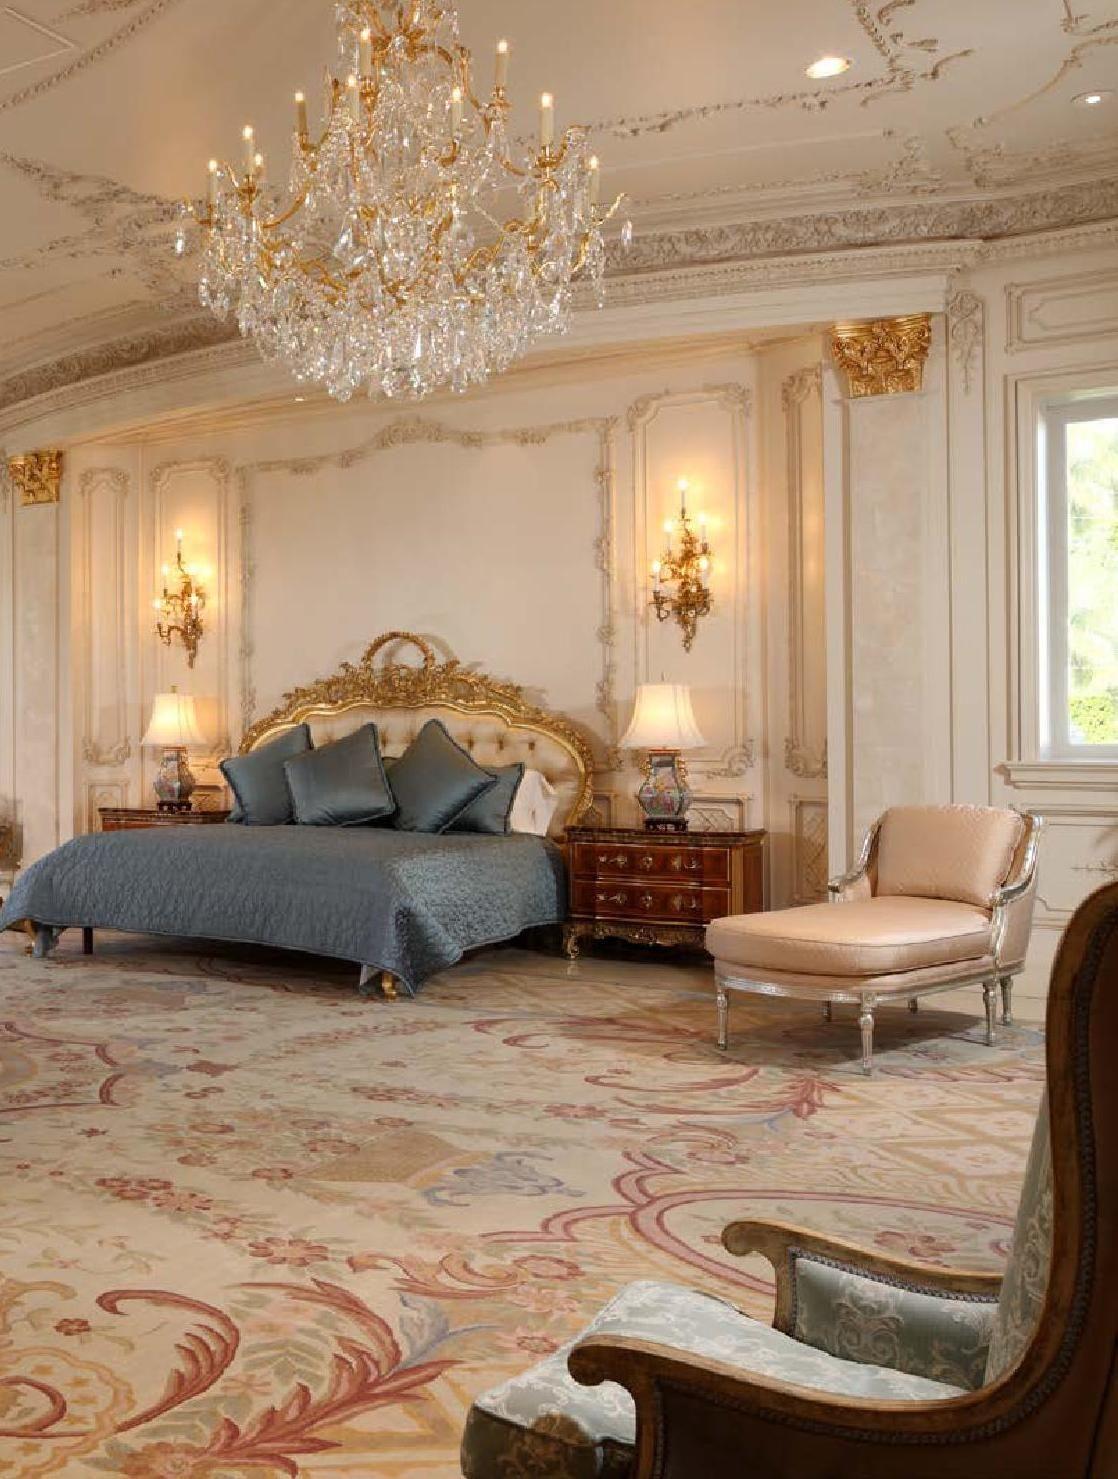 European Neo Classical Style Ii In 2019 Sims 4 European Bedroom